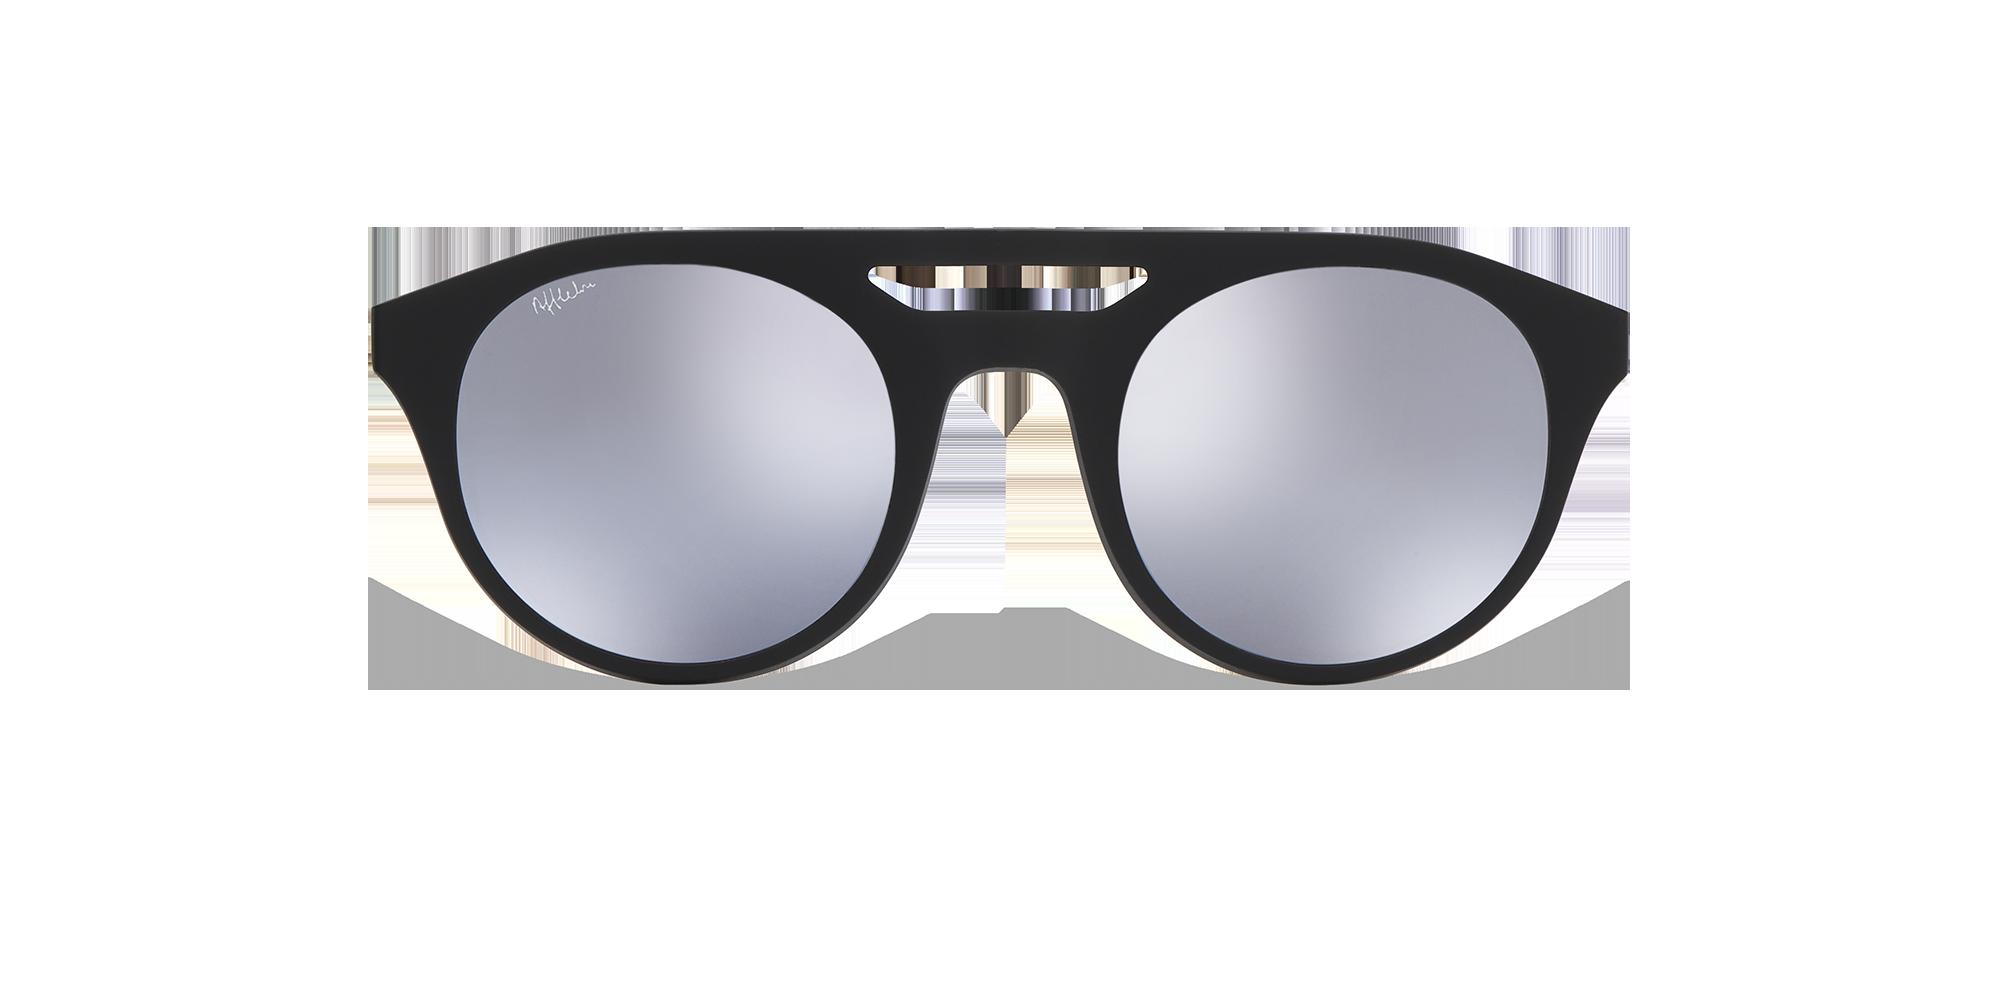 afflelou/france/products/smart_clip/clips_glasses/TMK37XLBK014919.png